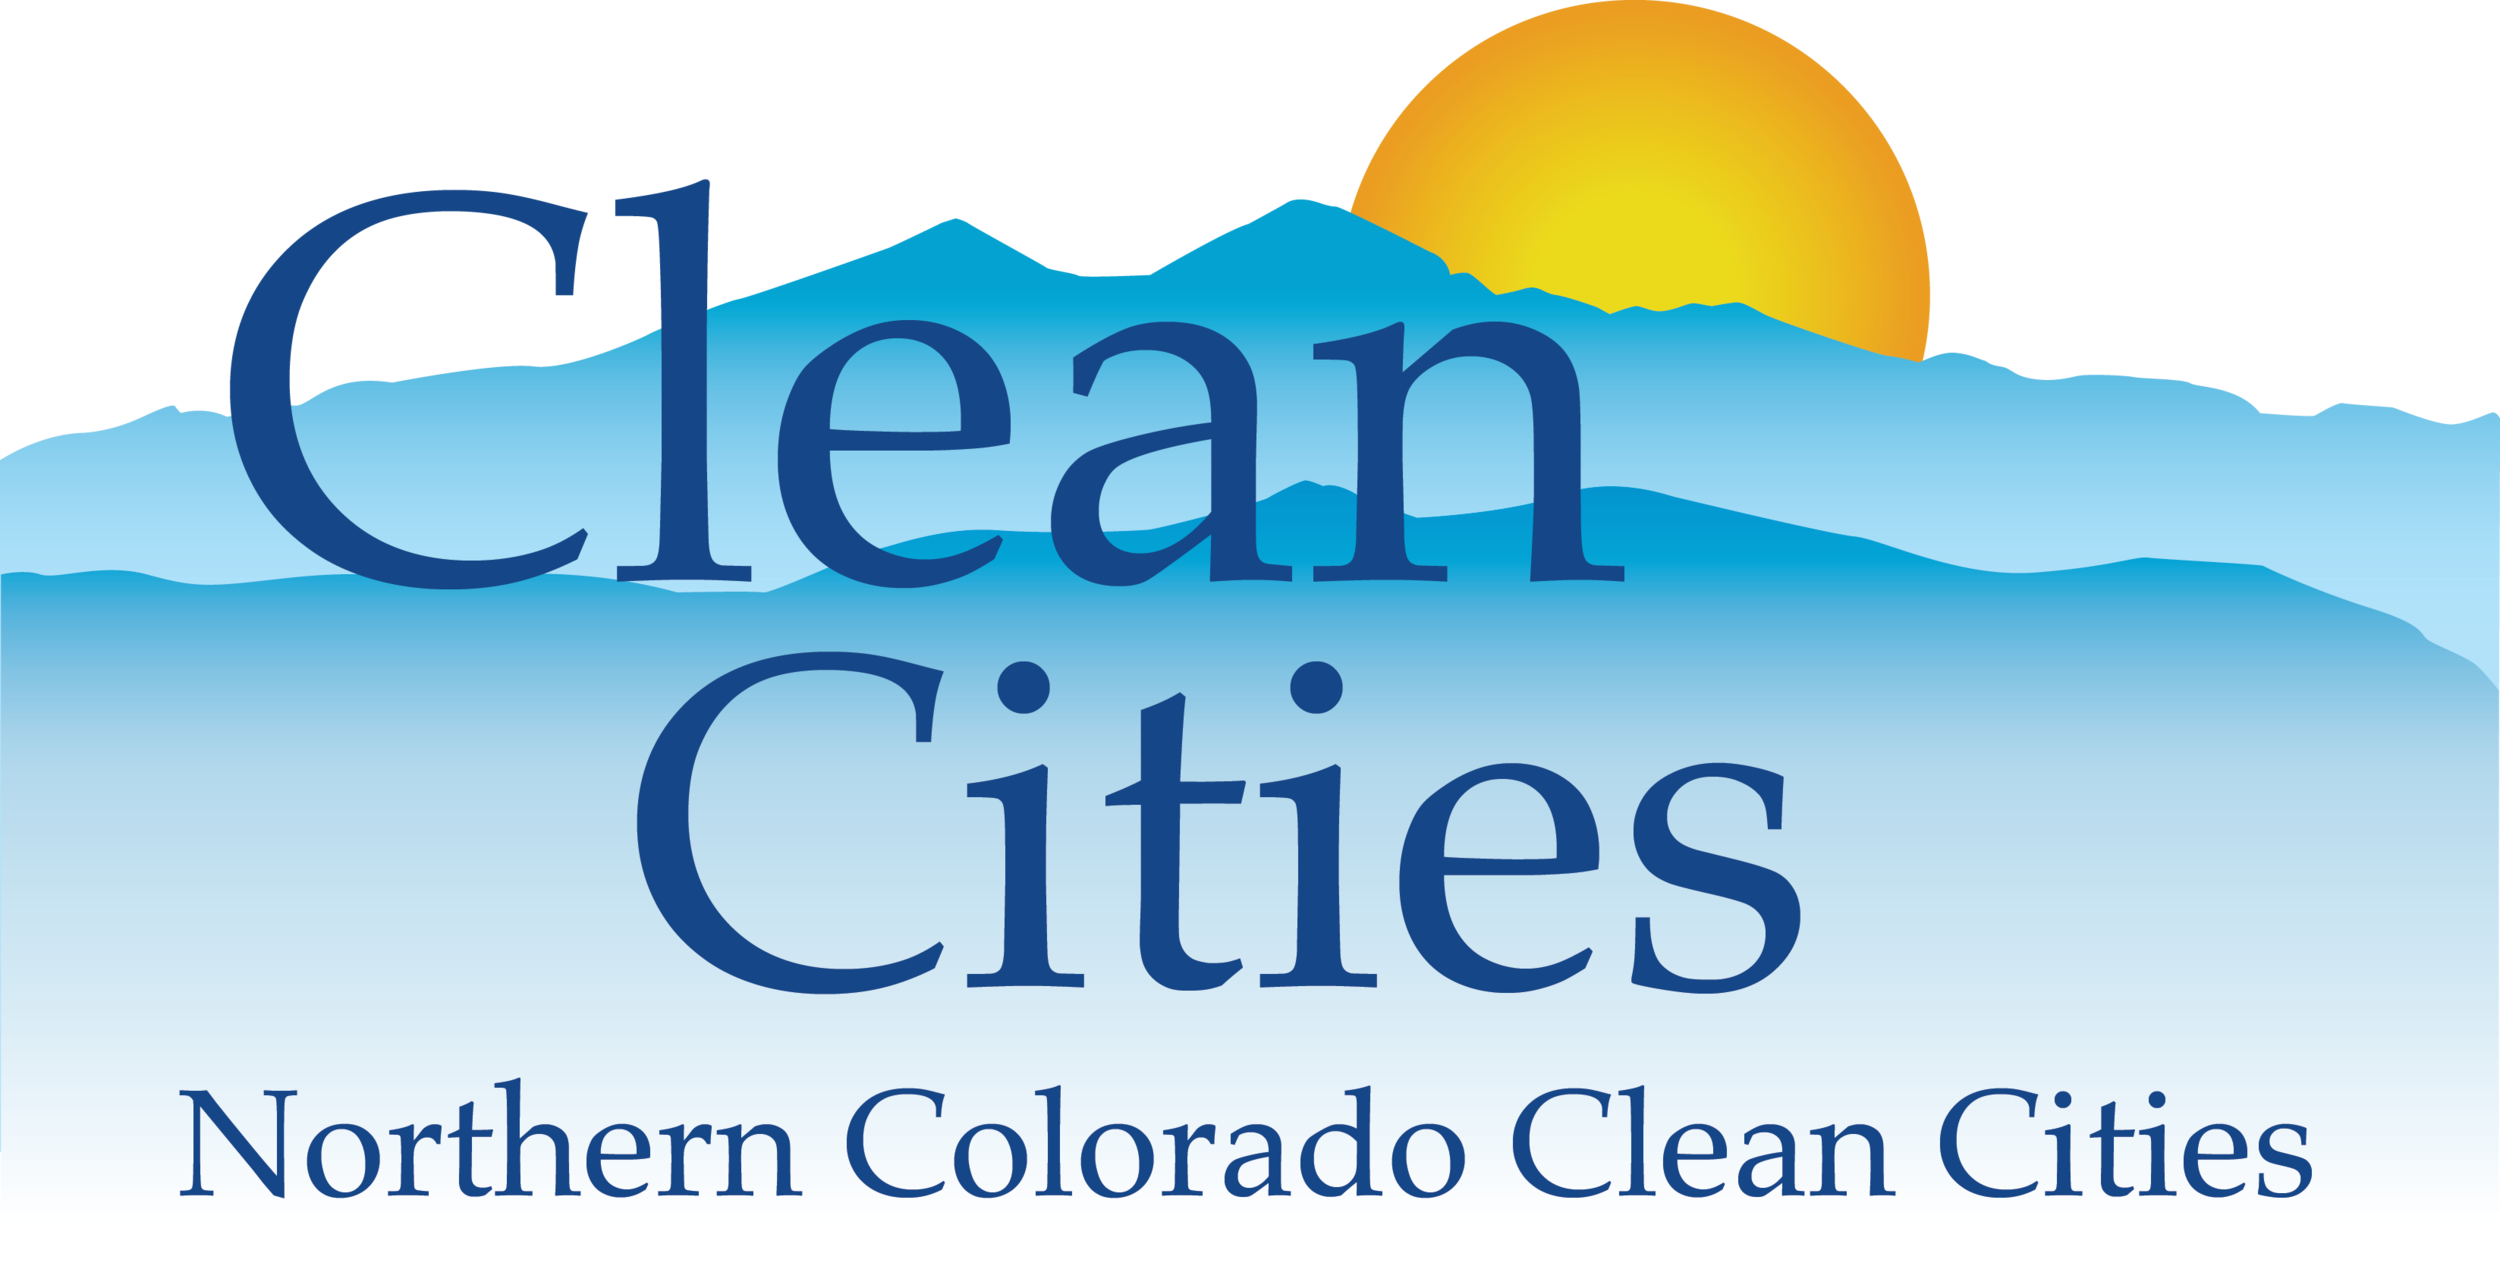 N.Colorado CC logo.png